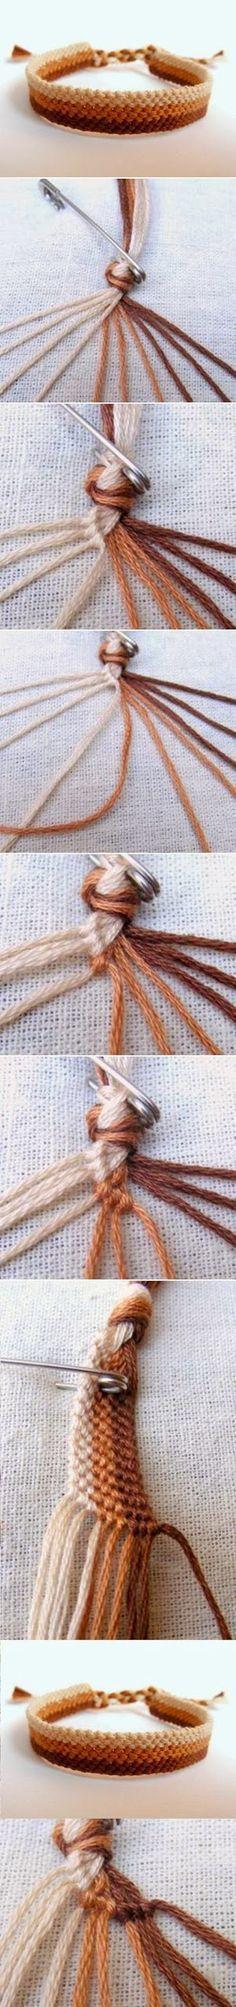 DIY : Easy Weave Bracelet | DIY & Crafts Tutorials